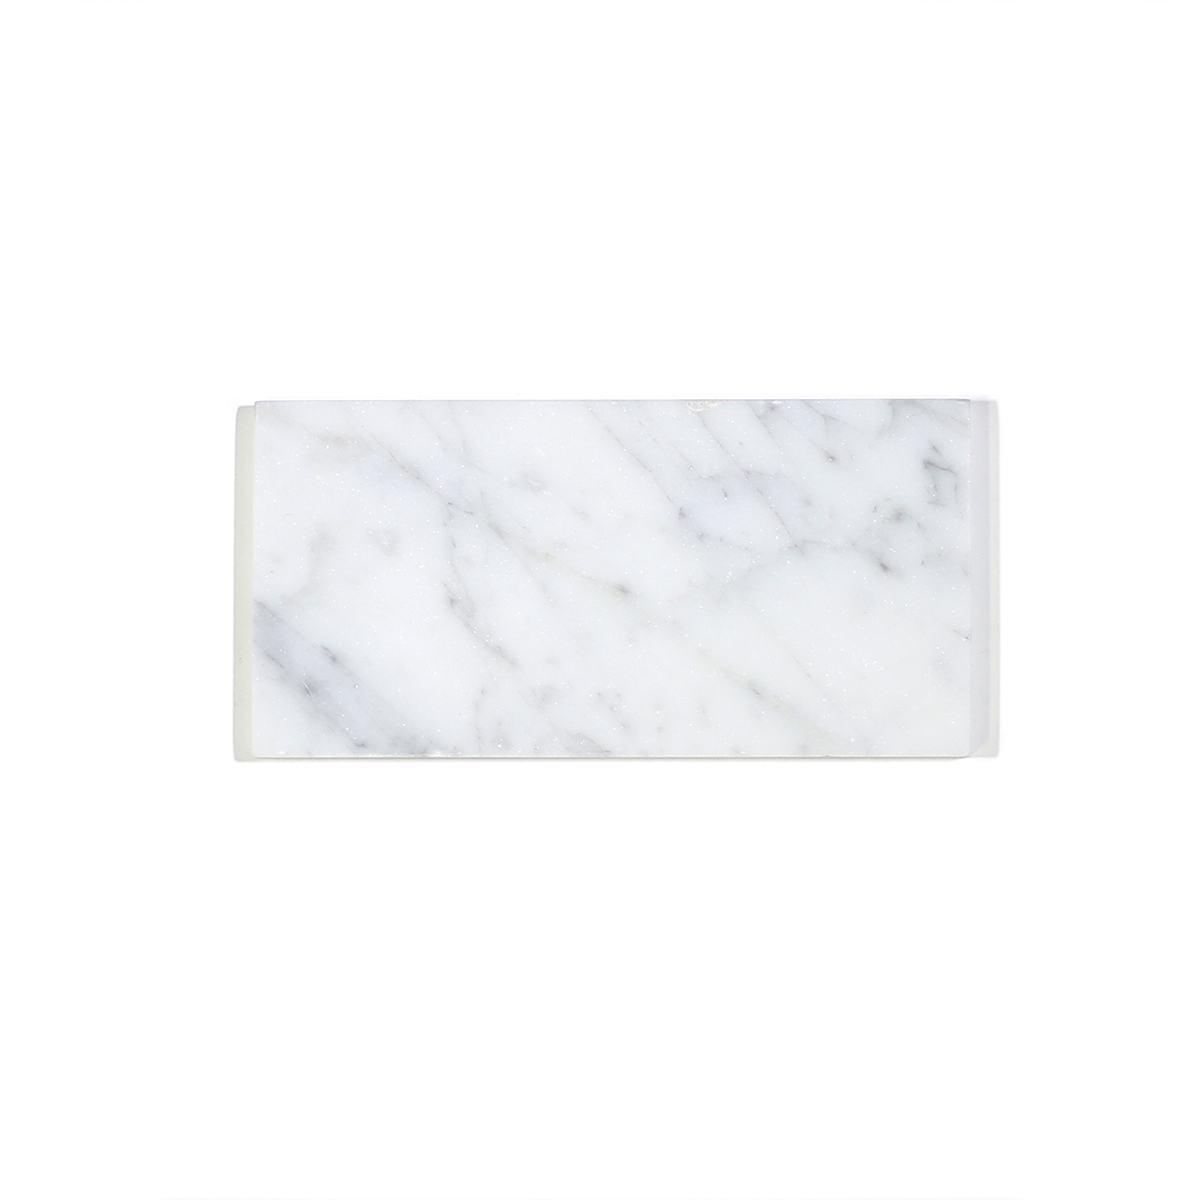 MA350-WCH  3 x 6 White Carrara HONED